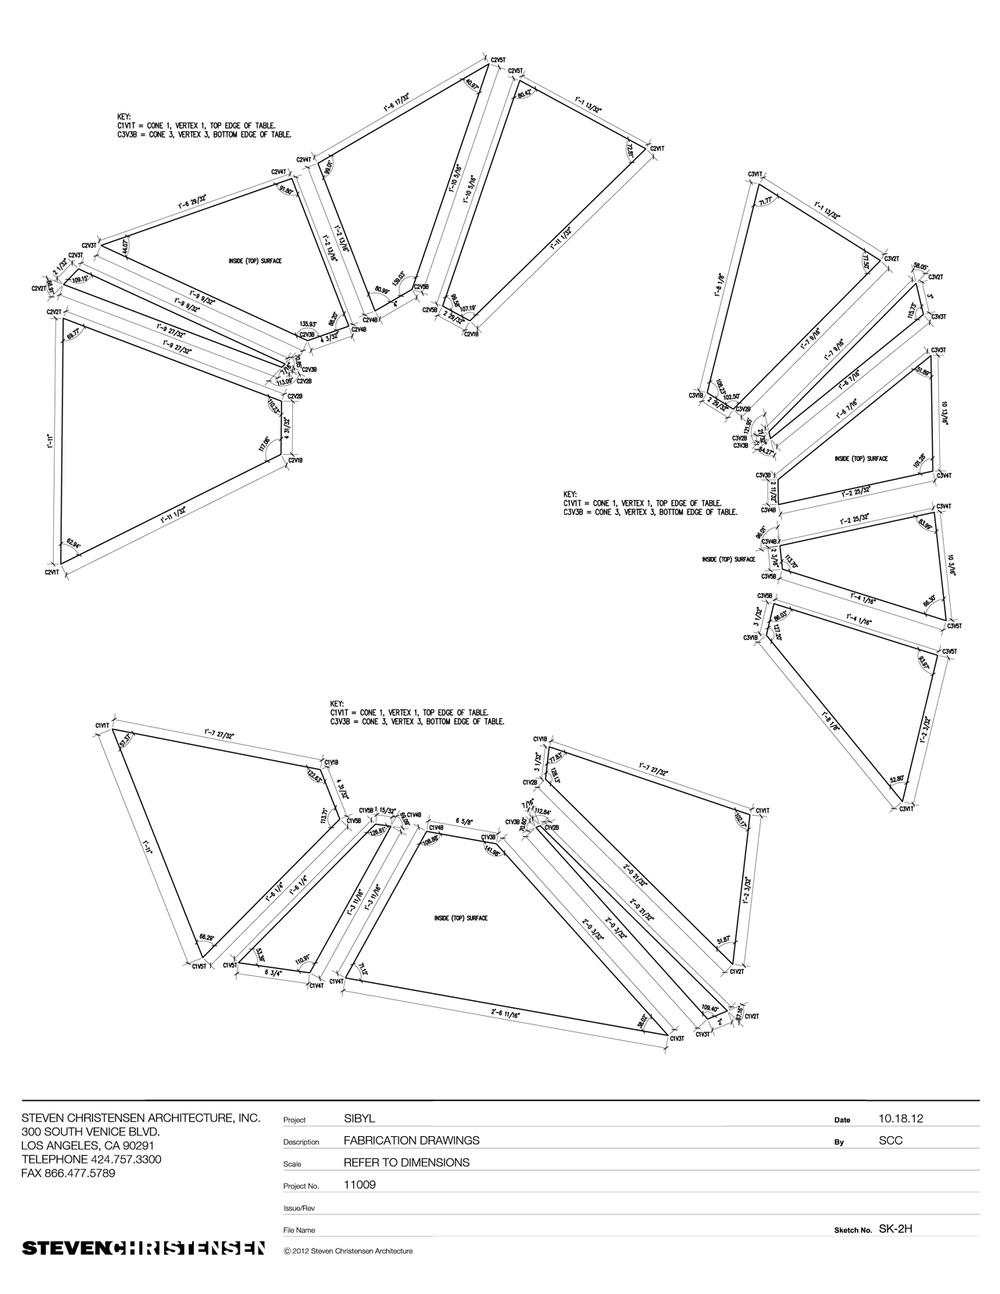 steven-christensen_sibyl_fabrication-drawings_2H_1280.png